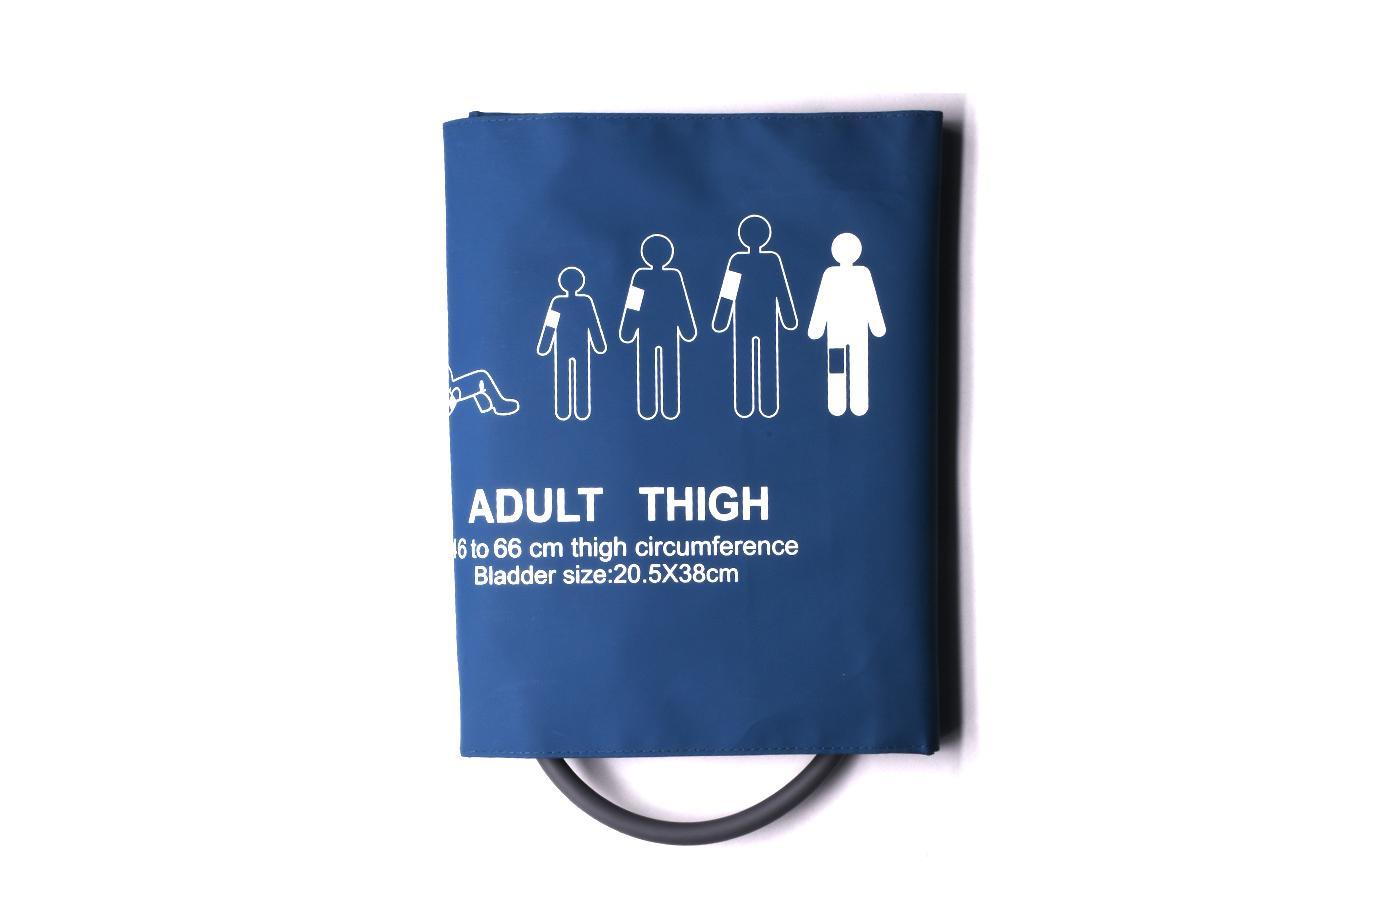 Single 20.5-38cm pressure cuff tube blood pressure NIBP cuff for adult thigh  1